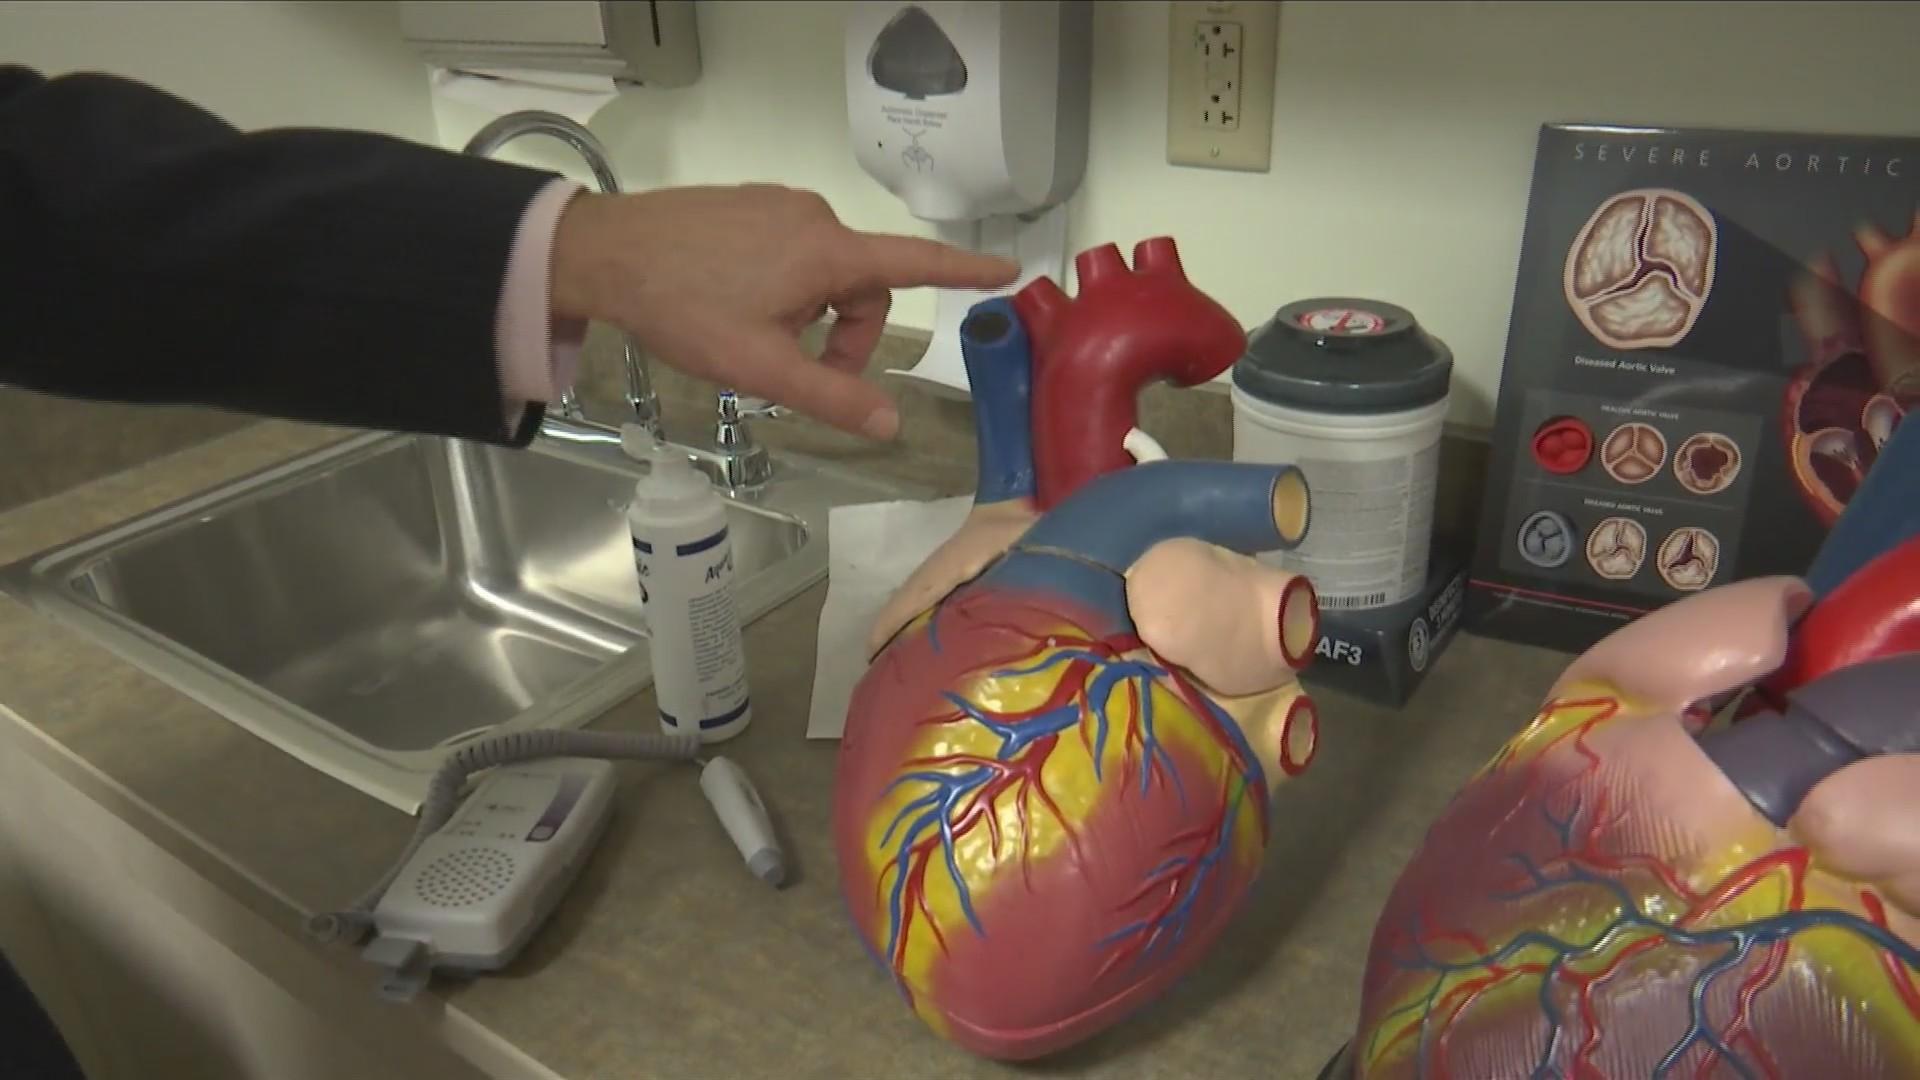 Heart_Health_Part_2__Healthy_habits_to_l_0_20190215223900